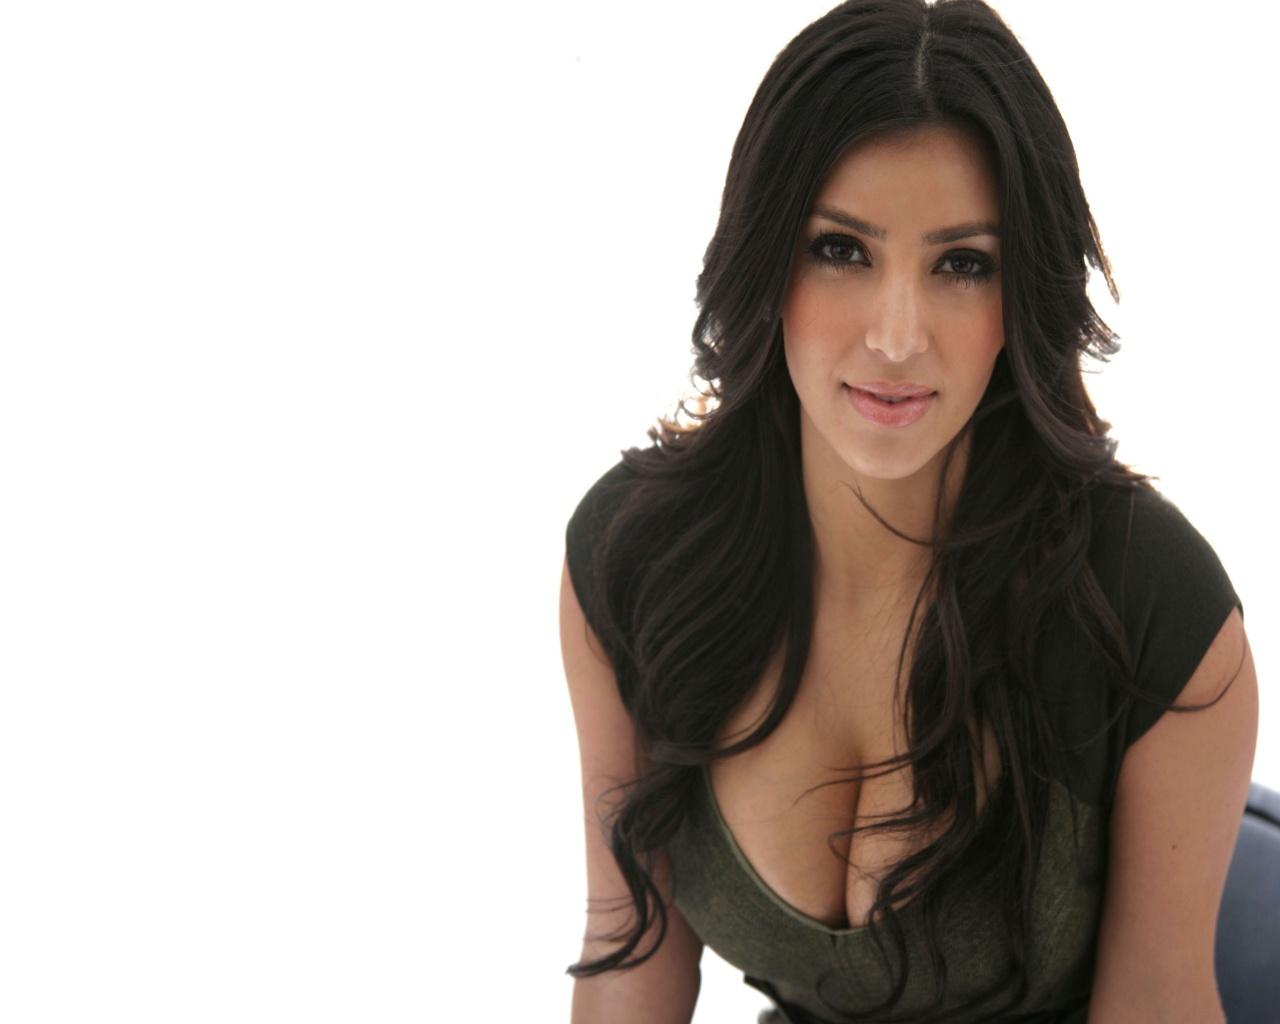 kim kardashian model hot wallpaper 12 fun hungama forsweetangels 1280x1024